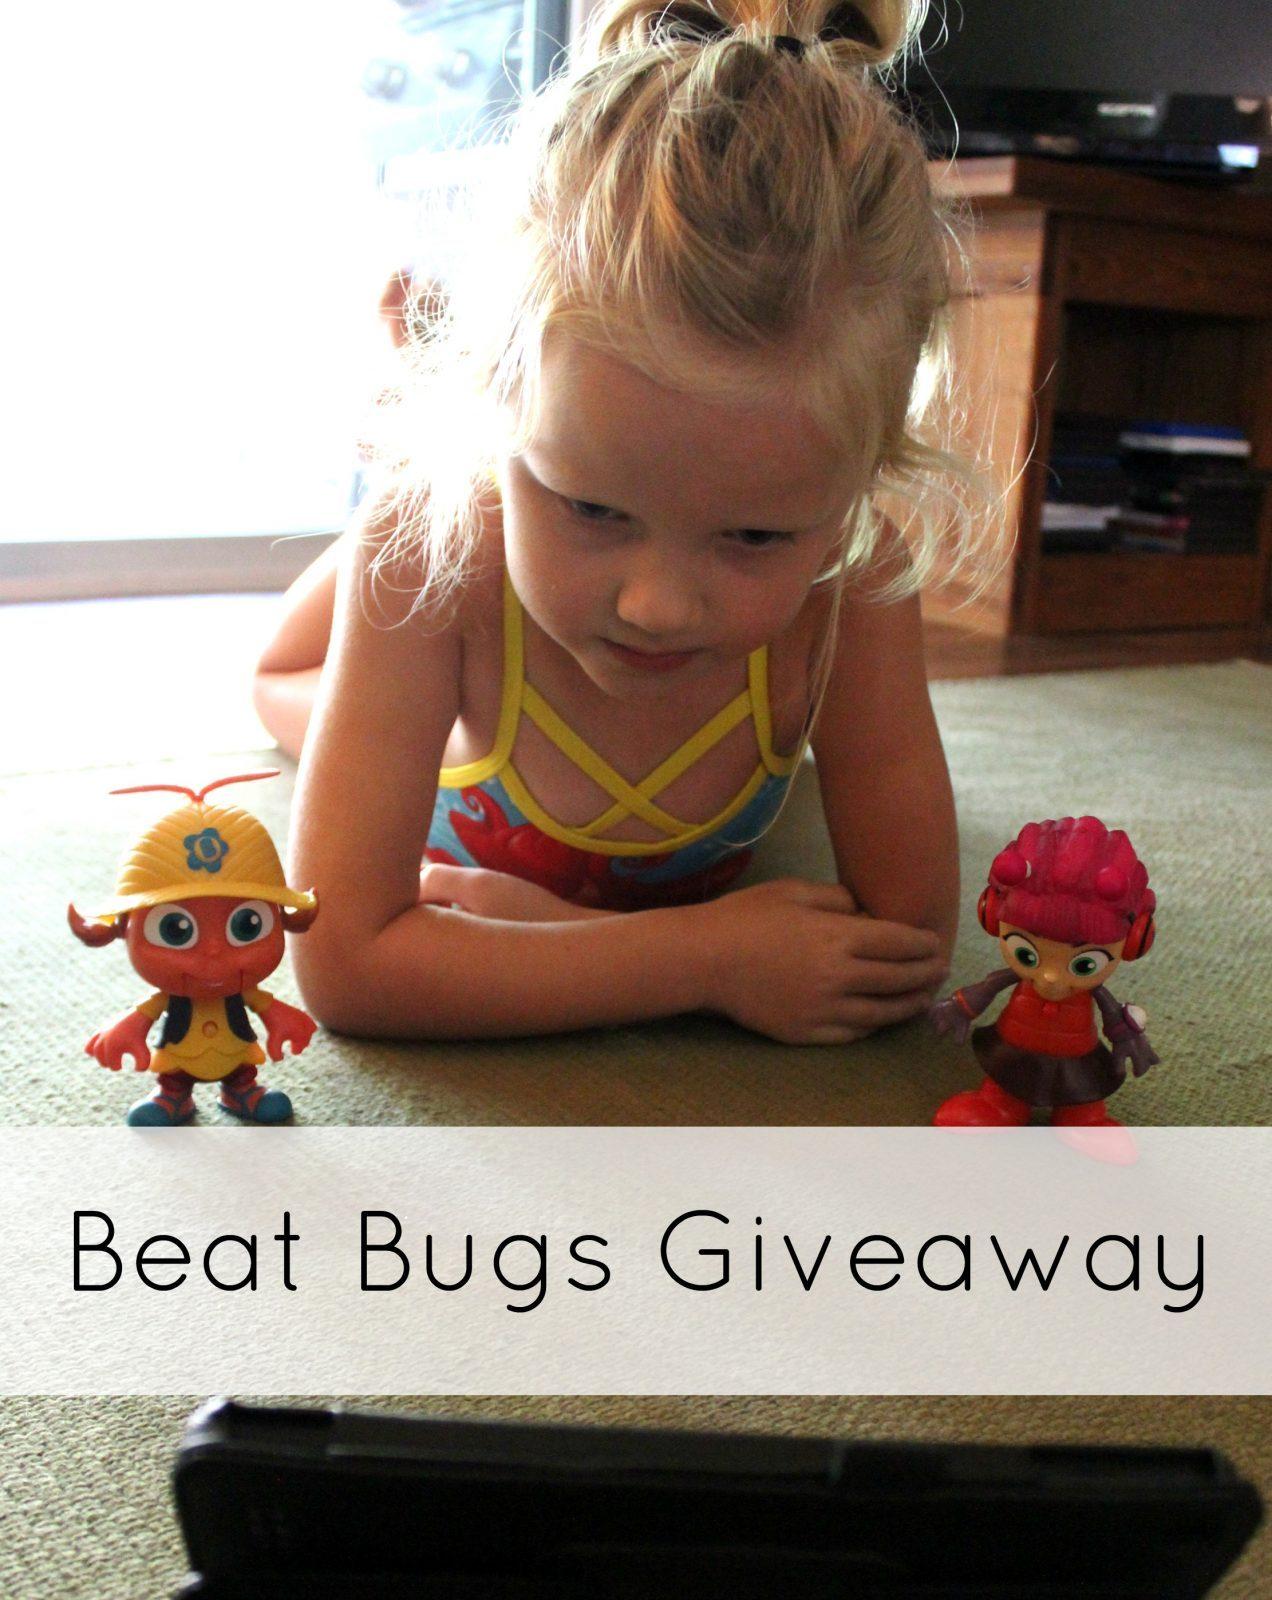 beat bugs giveaway pinterest image